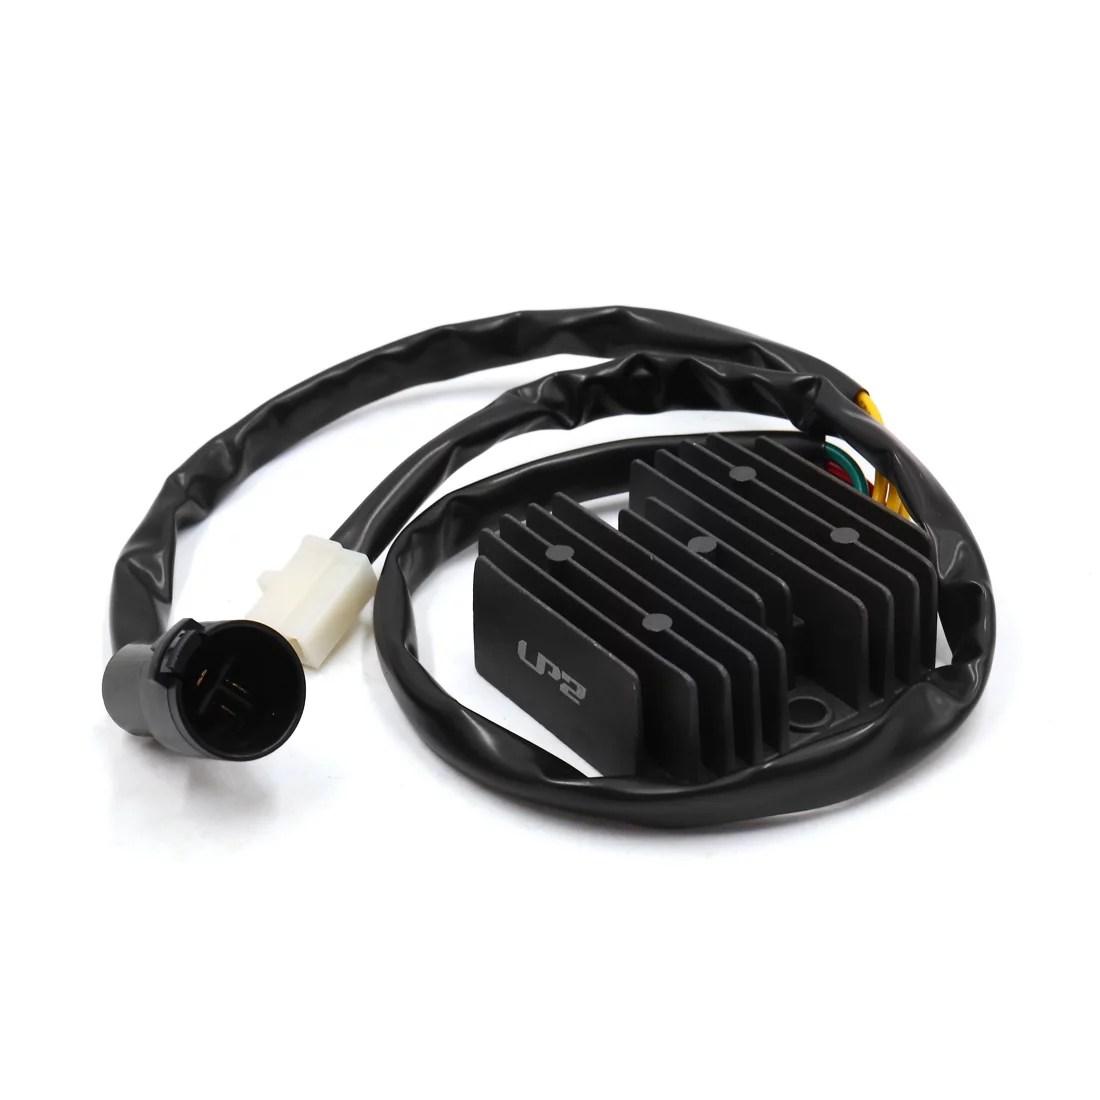 hight resolution of dc 12v black metal motorcycle voltage regulator rectifier for honda atv trx300